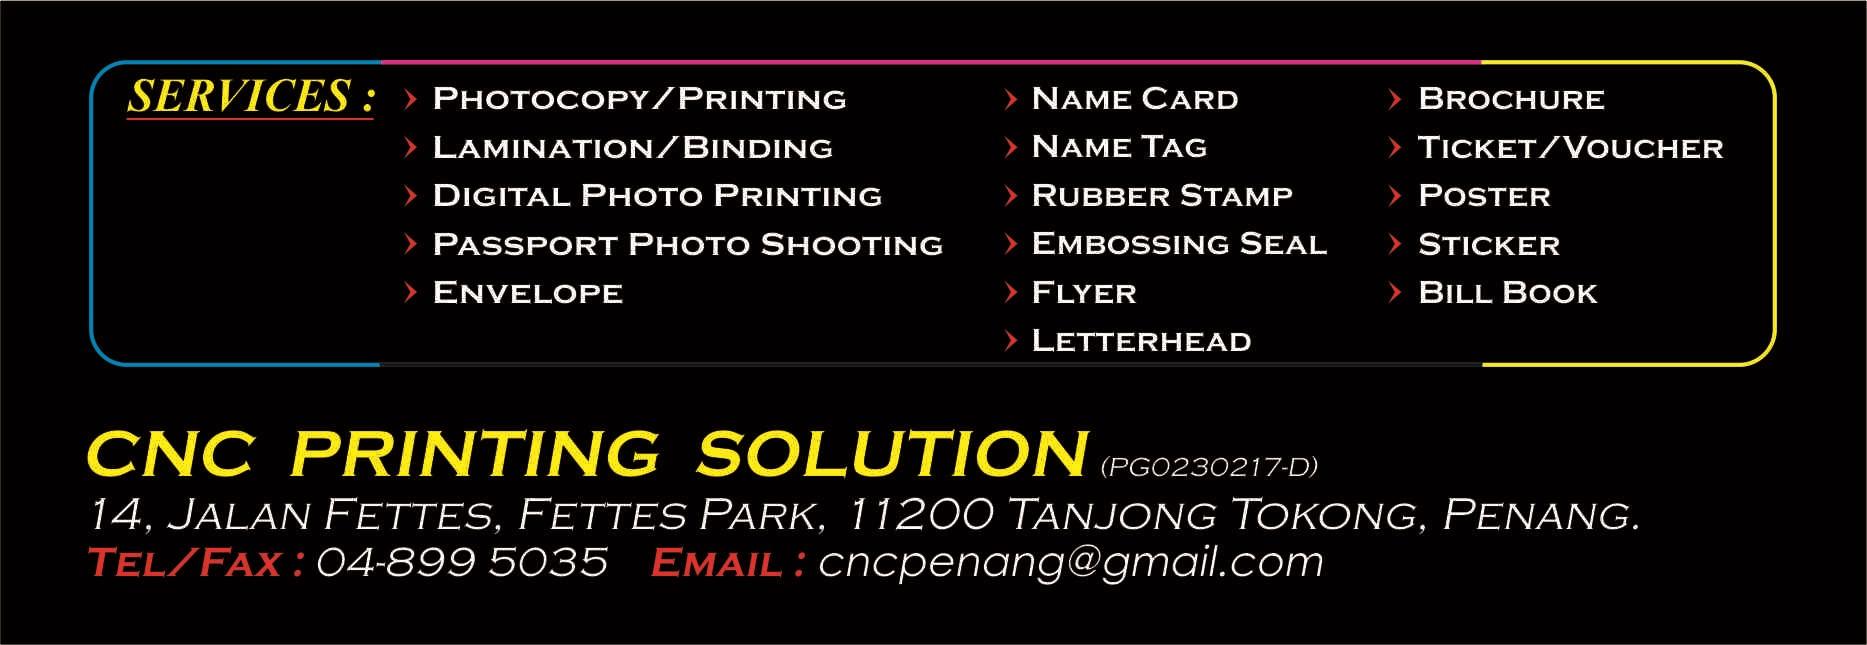 CNC Printing Solution